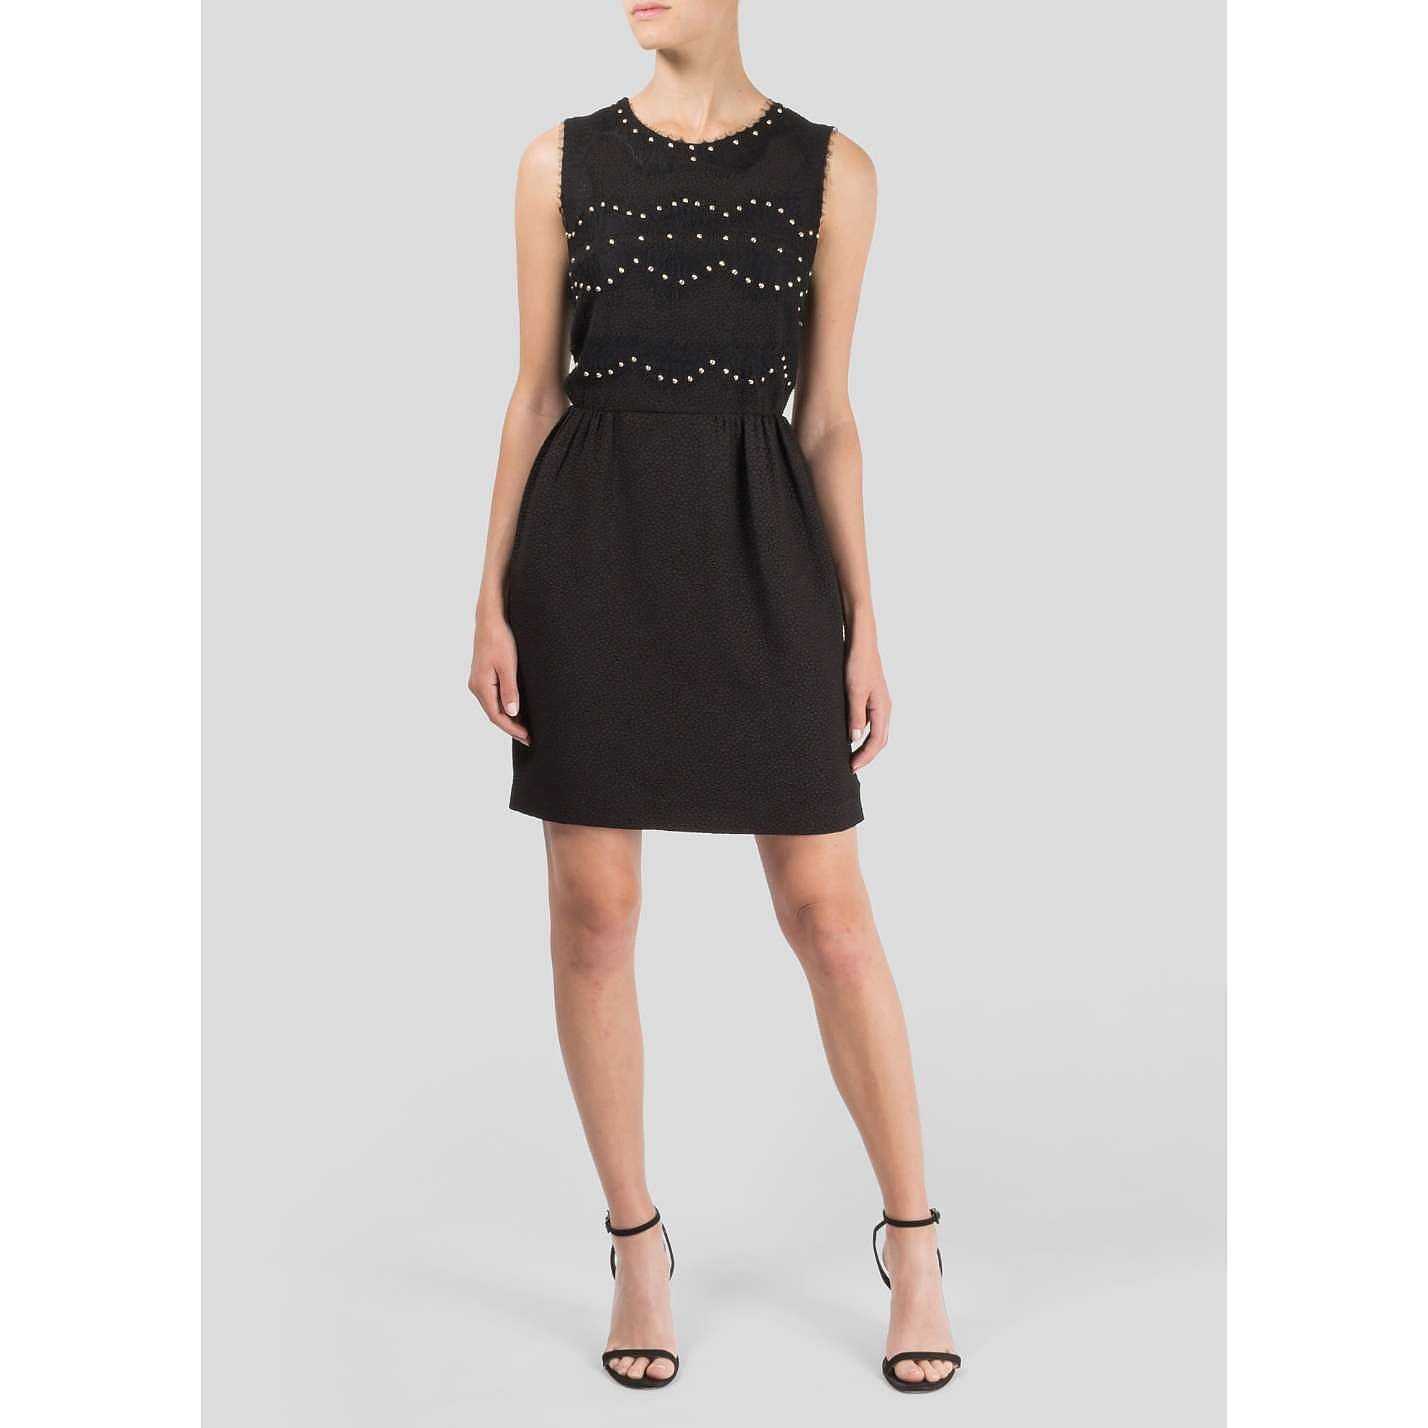 Sandro Studded Dress